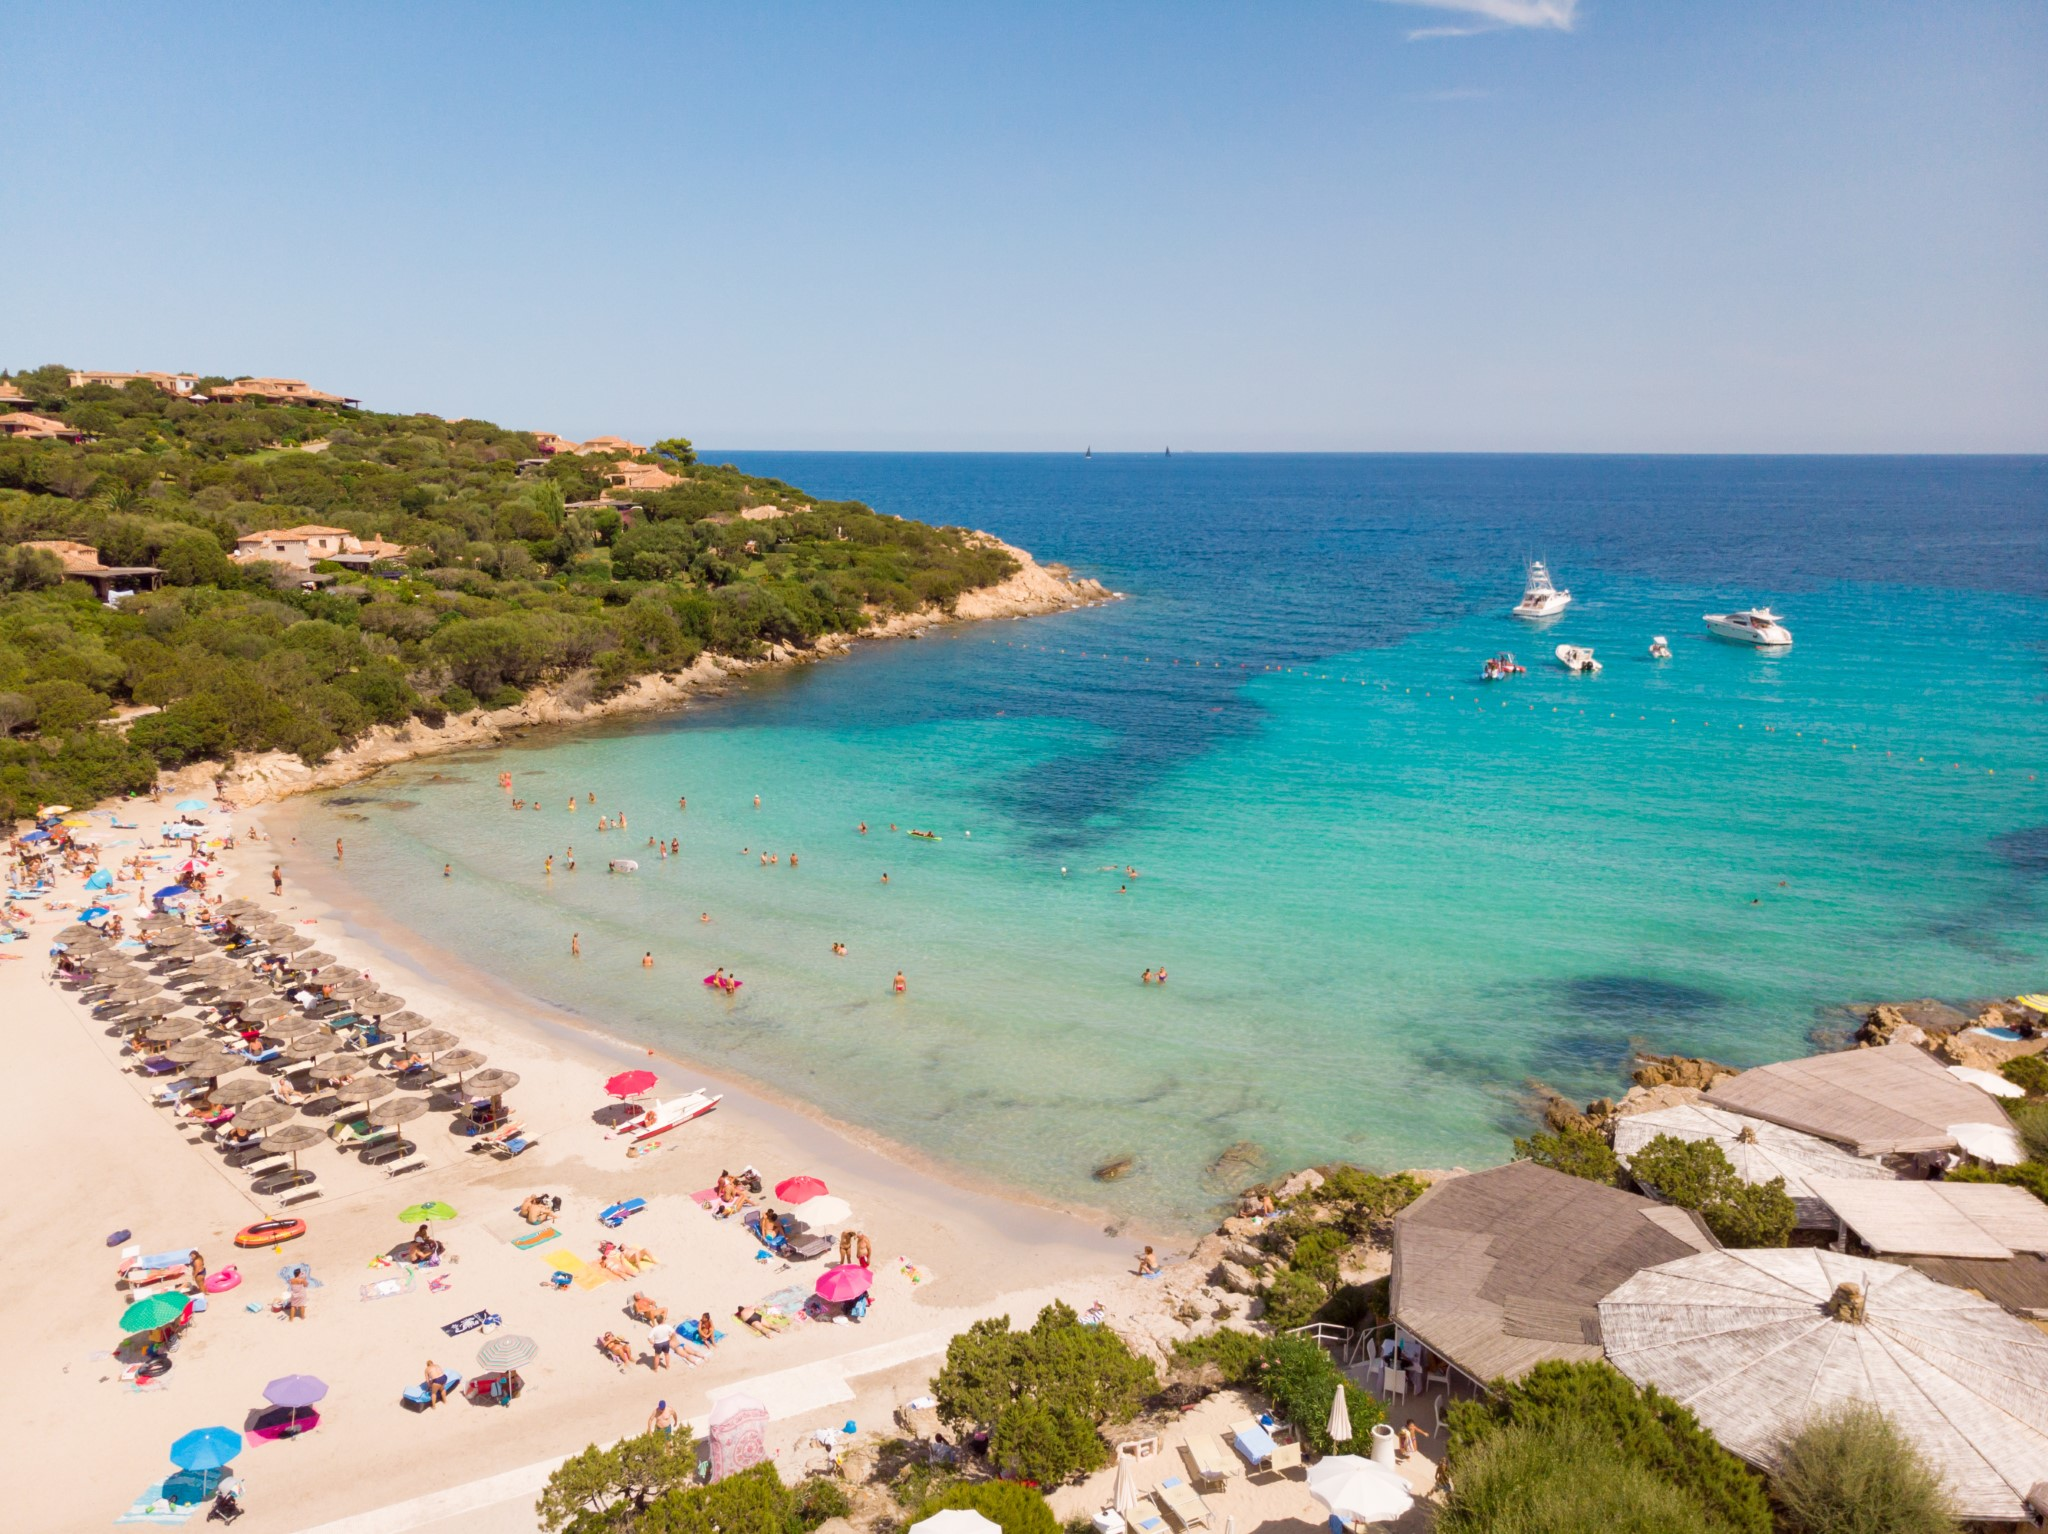 Wonderful turquoise blue colors of the sea of Cala Granu beach, bay near Porto Cervo in Costa Smeralda, Sardinia, Italy.